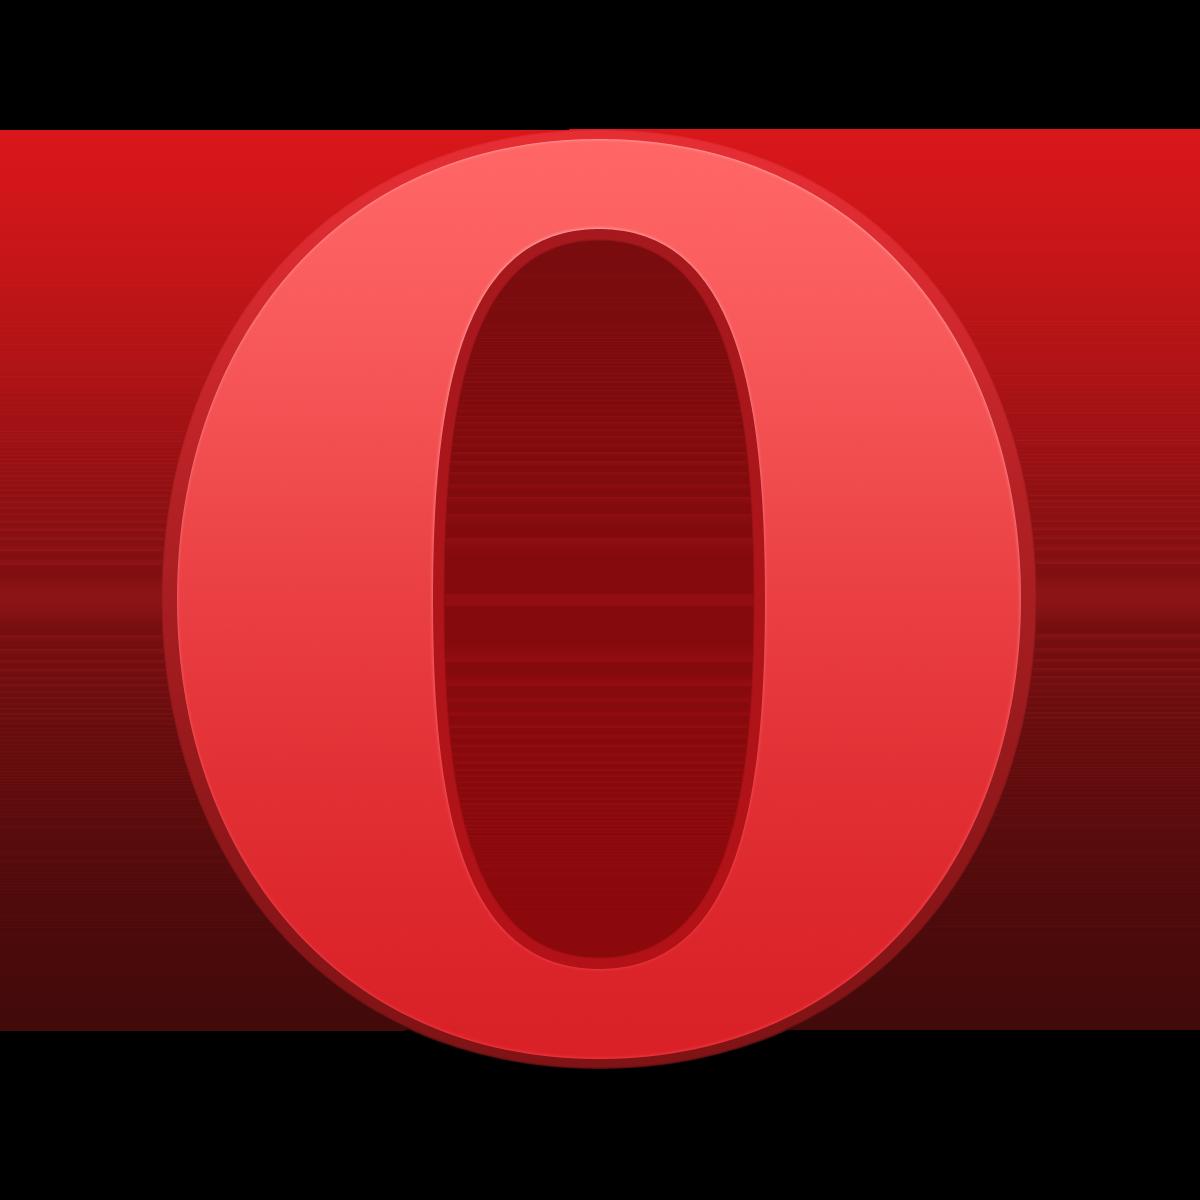 Opera Hd Icon